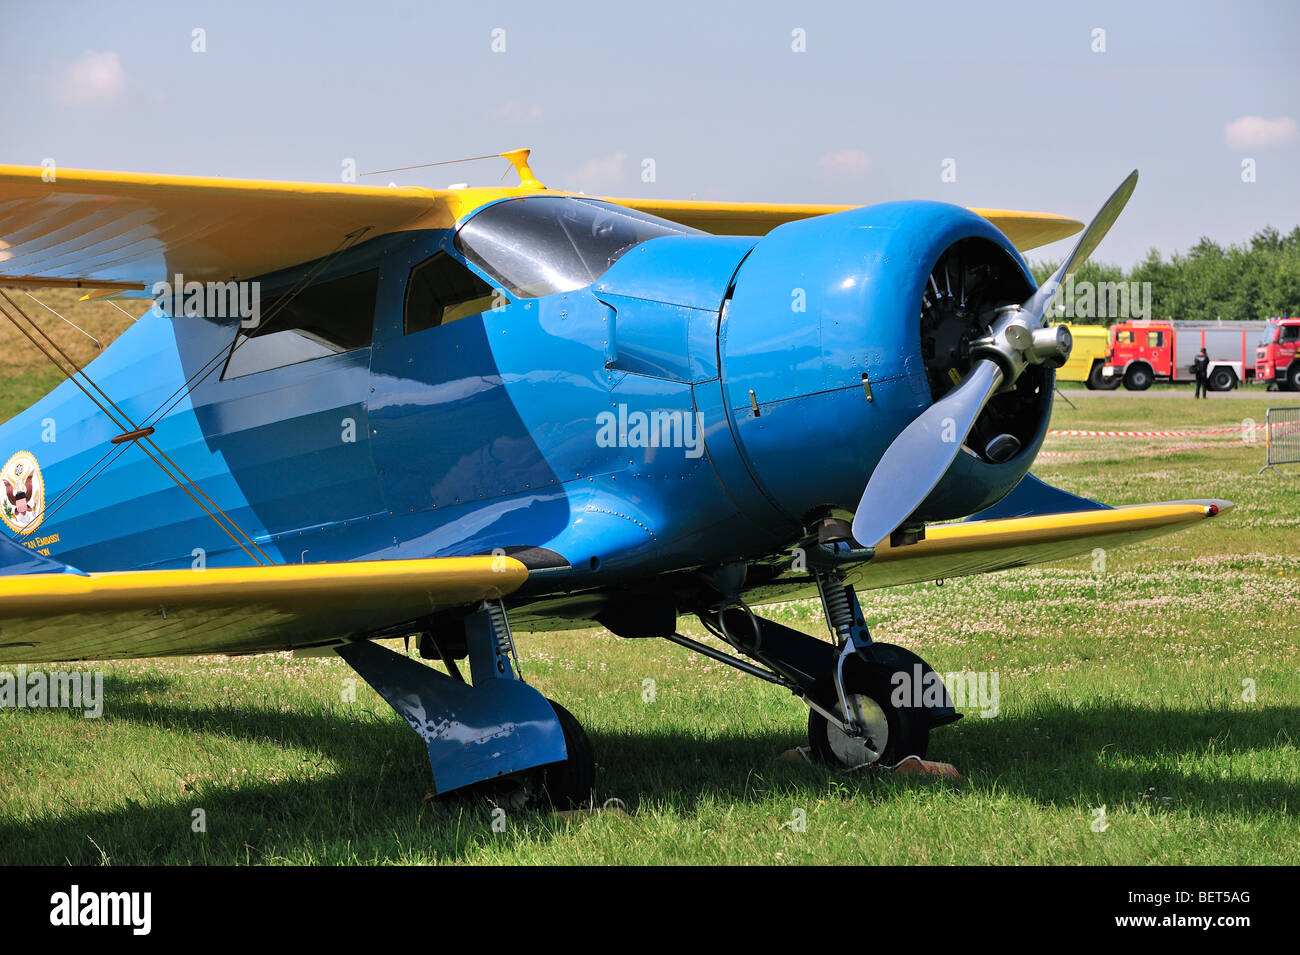 Biplane Beechcraft D17S Staggerwing at the airshow at Koksijde, Belgium - Stock Image